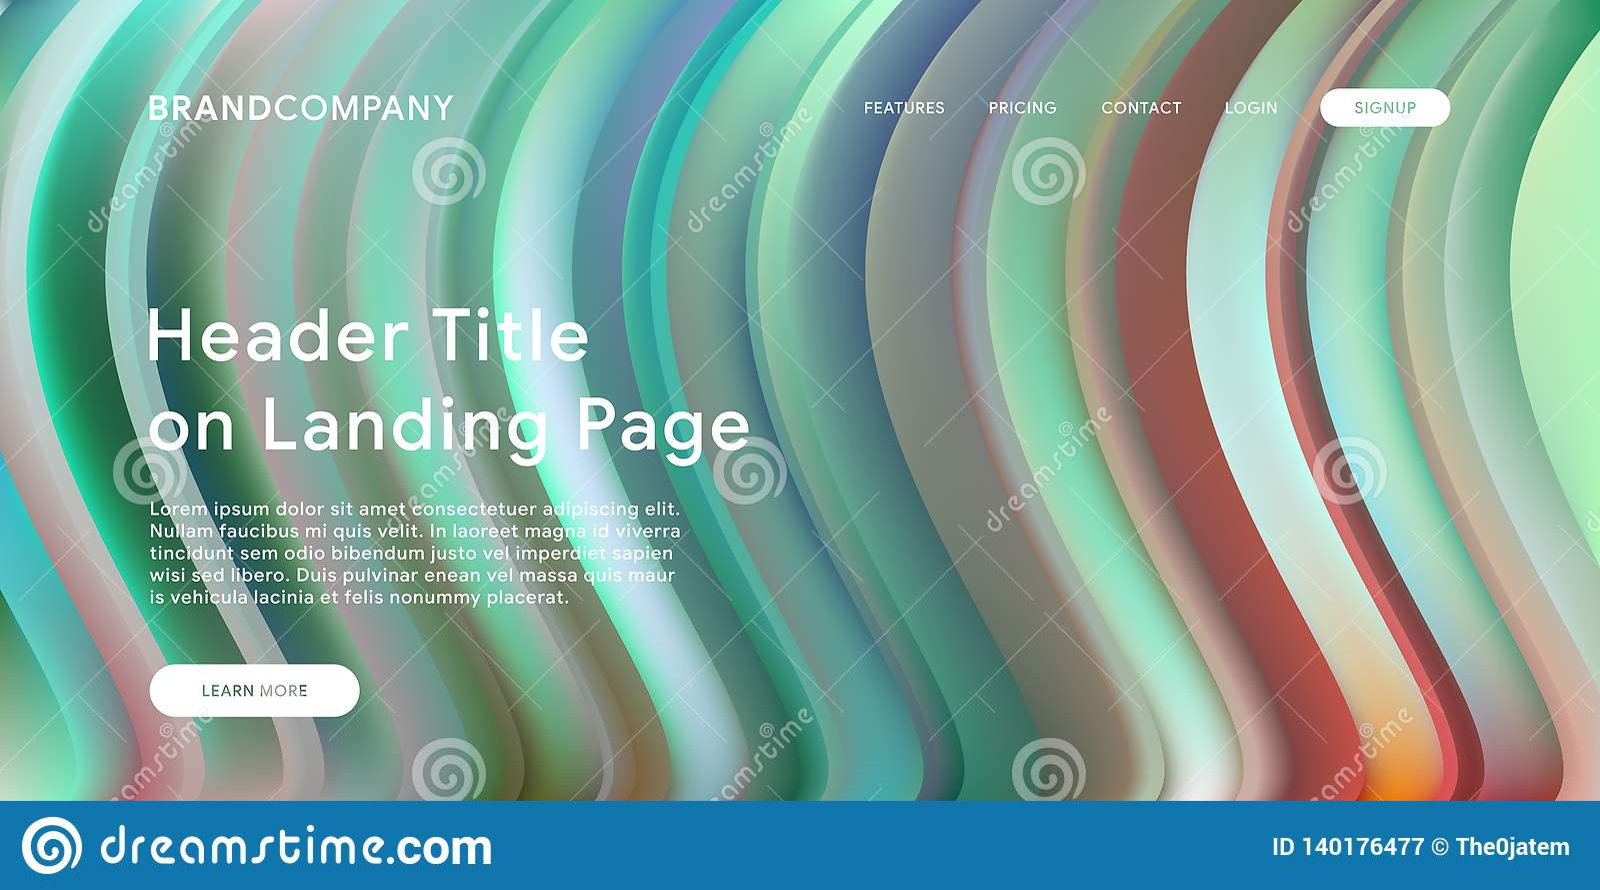 Creative design with fluid colorful shapes. Trendy color gradients. Strip design. Fluid shapes composition. Futuristic design.